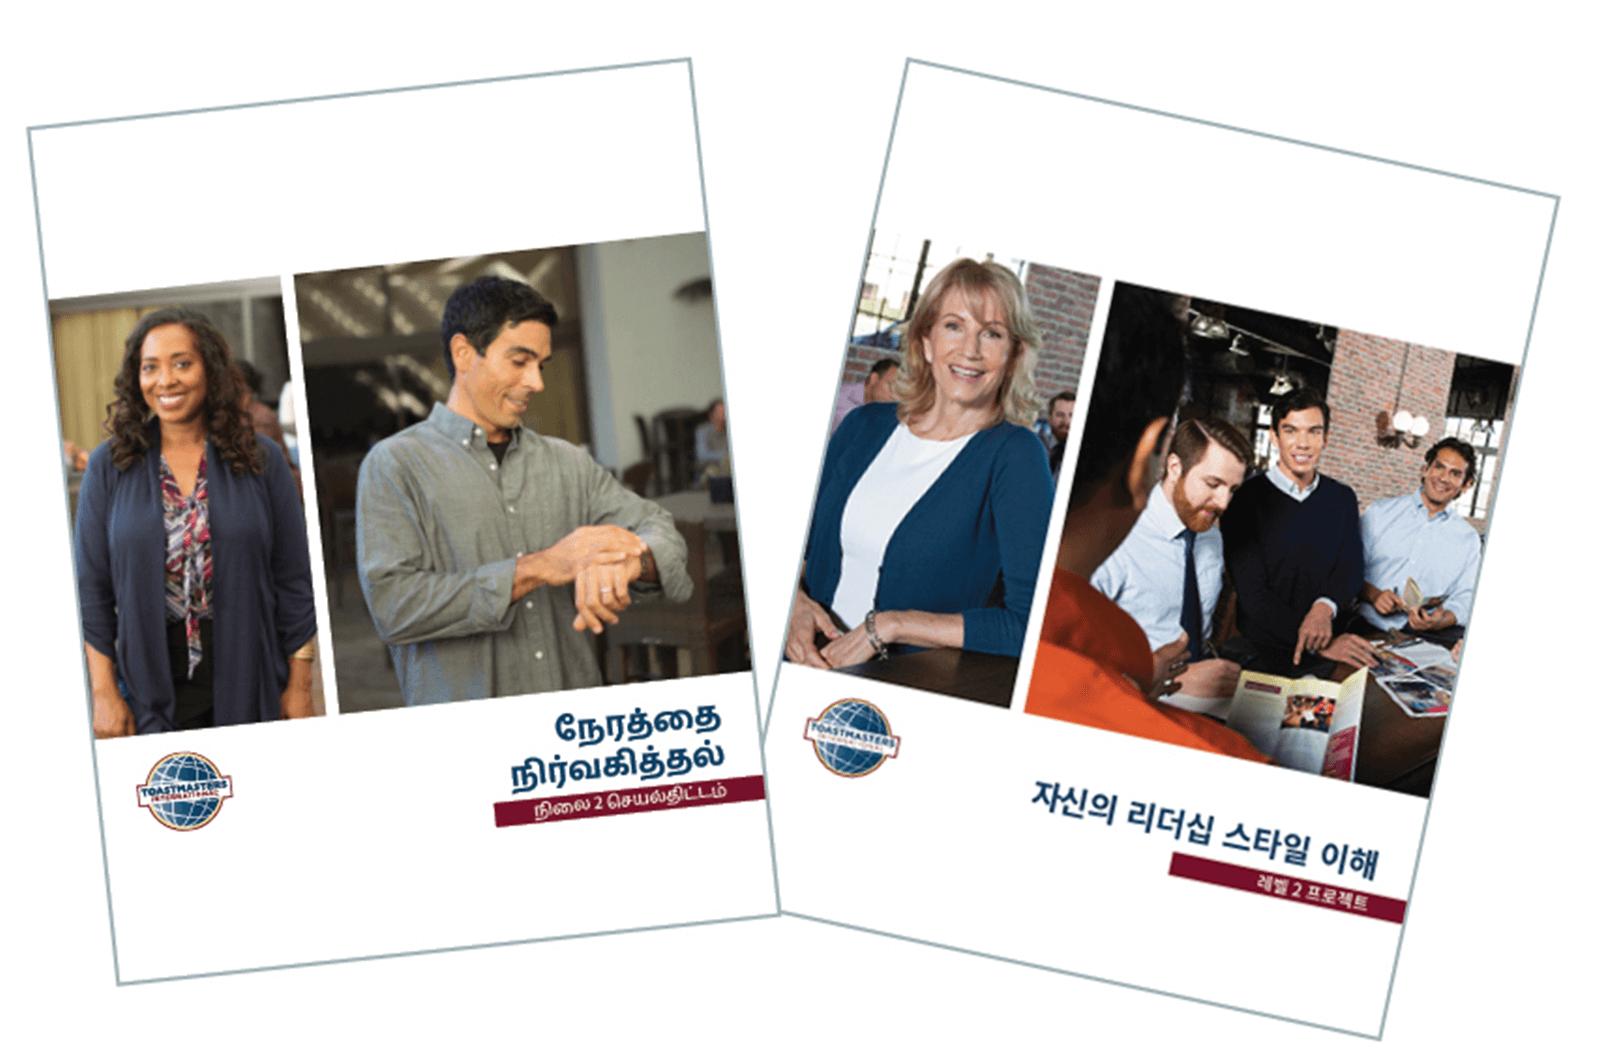 Pathways materials in Korean and Tamil